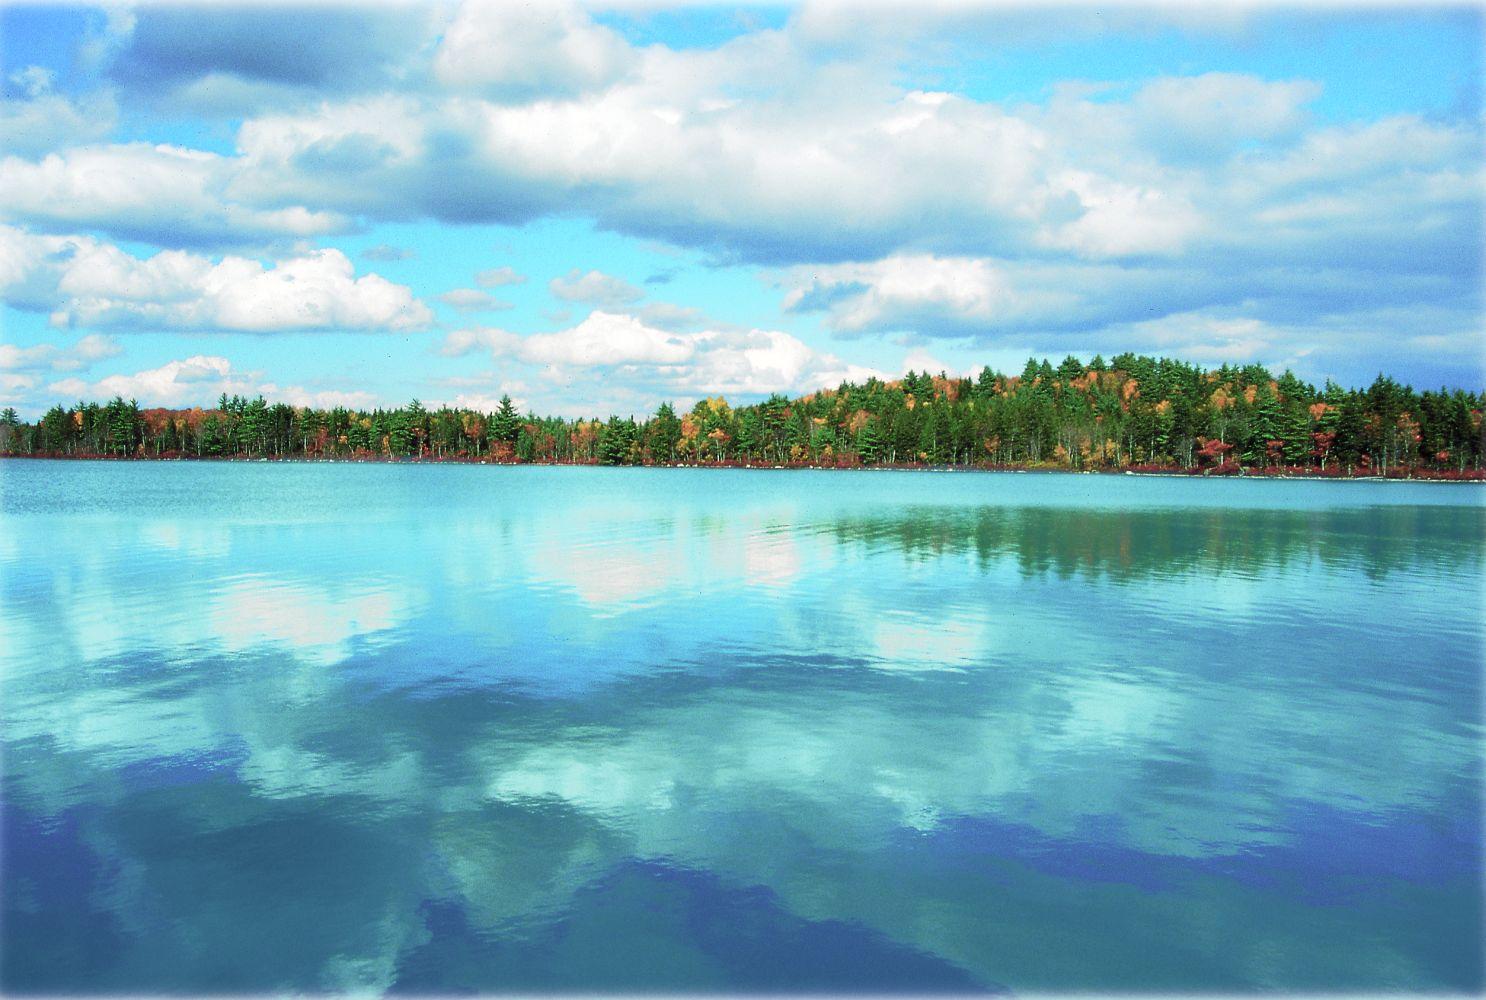 Kaufinseln Little Tupper Lake Nova Scotia Kanada Ost Zentral